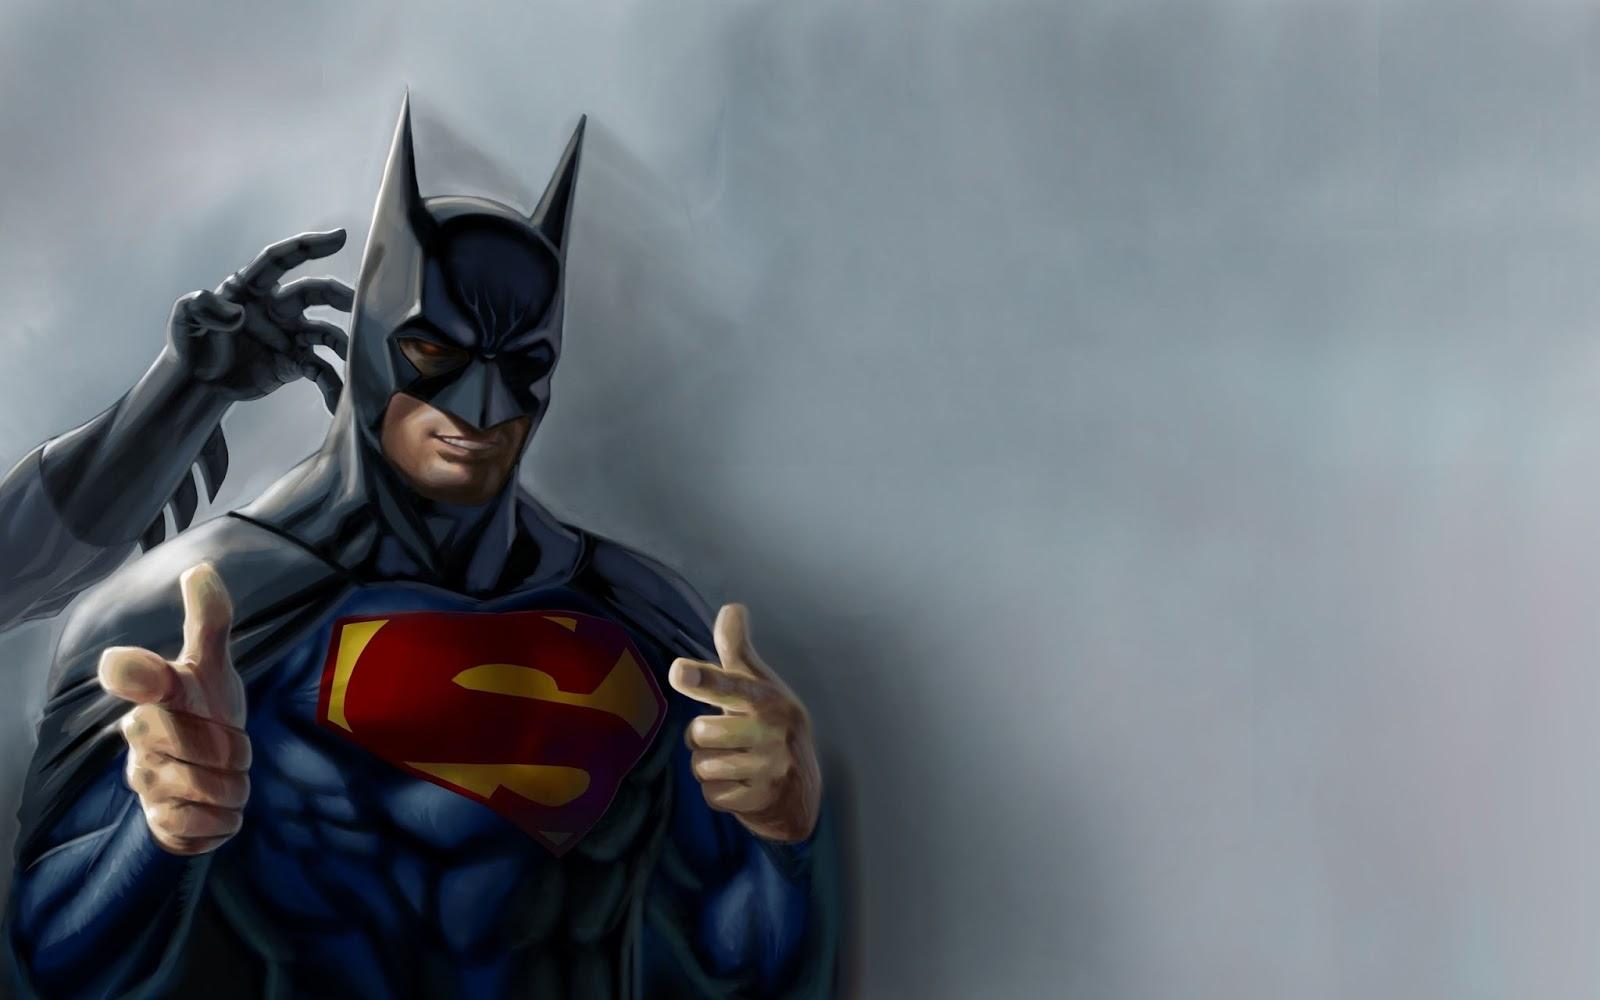 wallpapers batman superman - photo #29